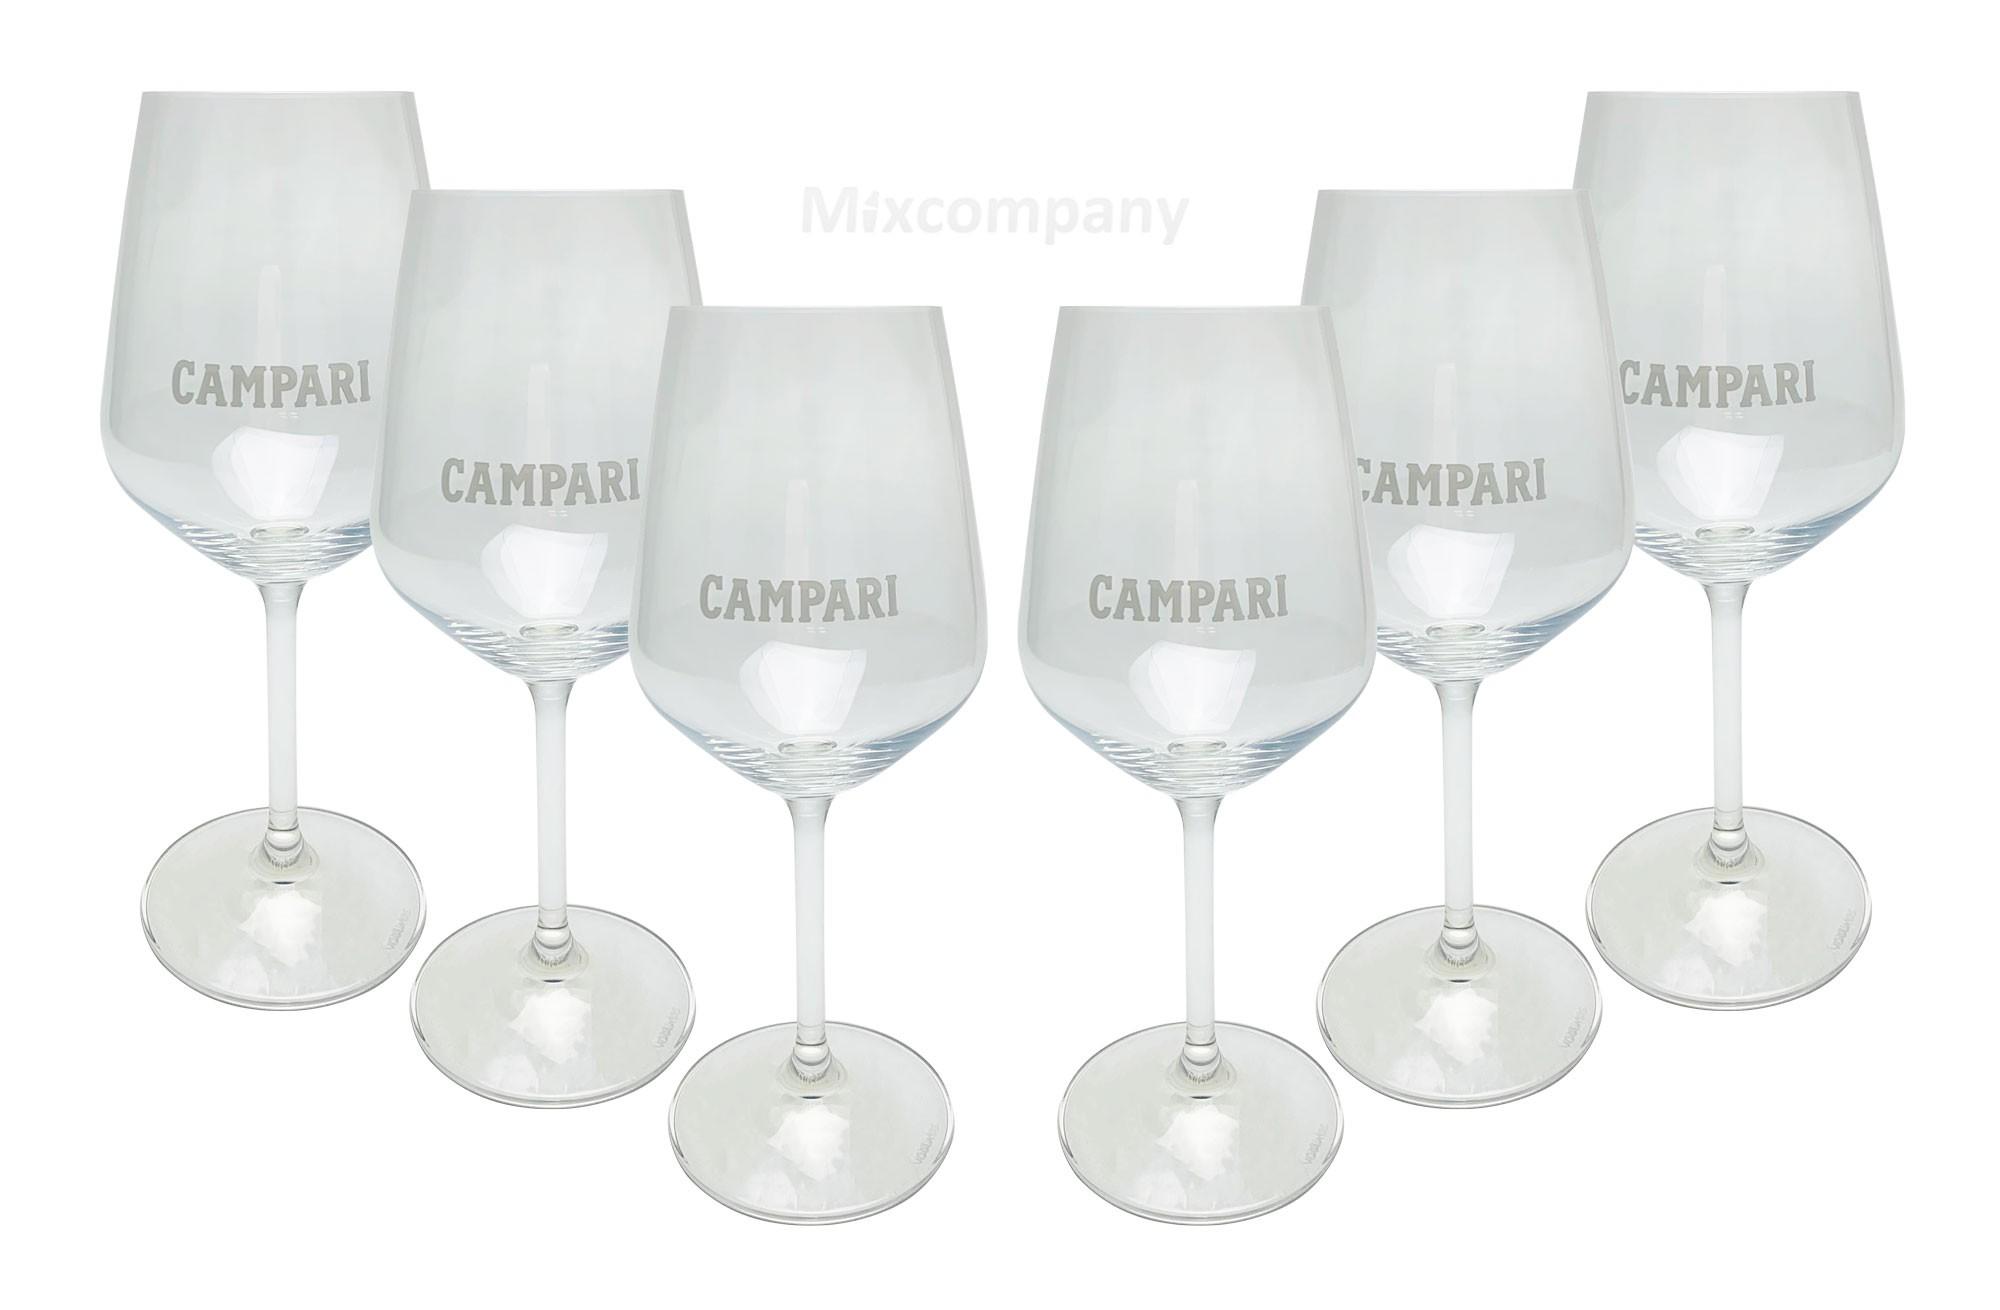 Campari Glas Gläser Set - 6x Weingläser